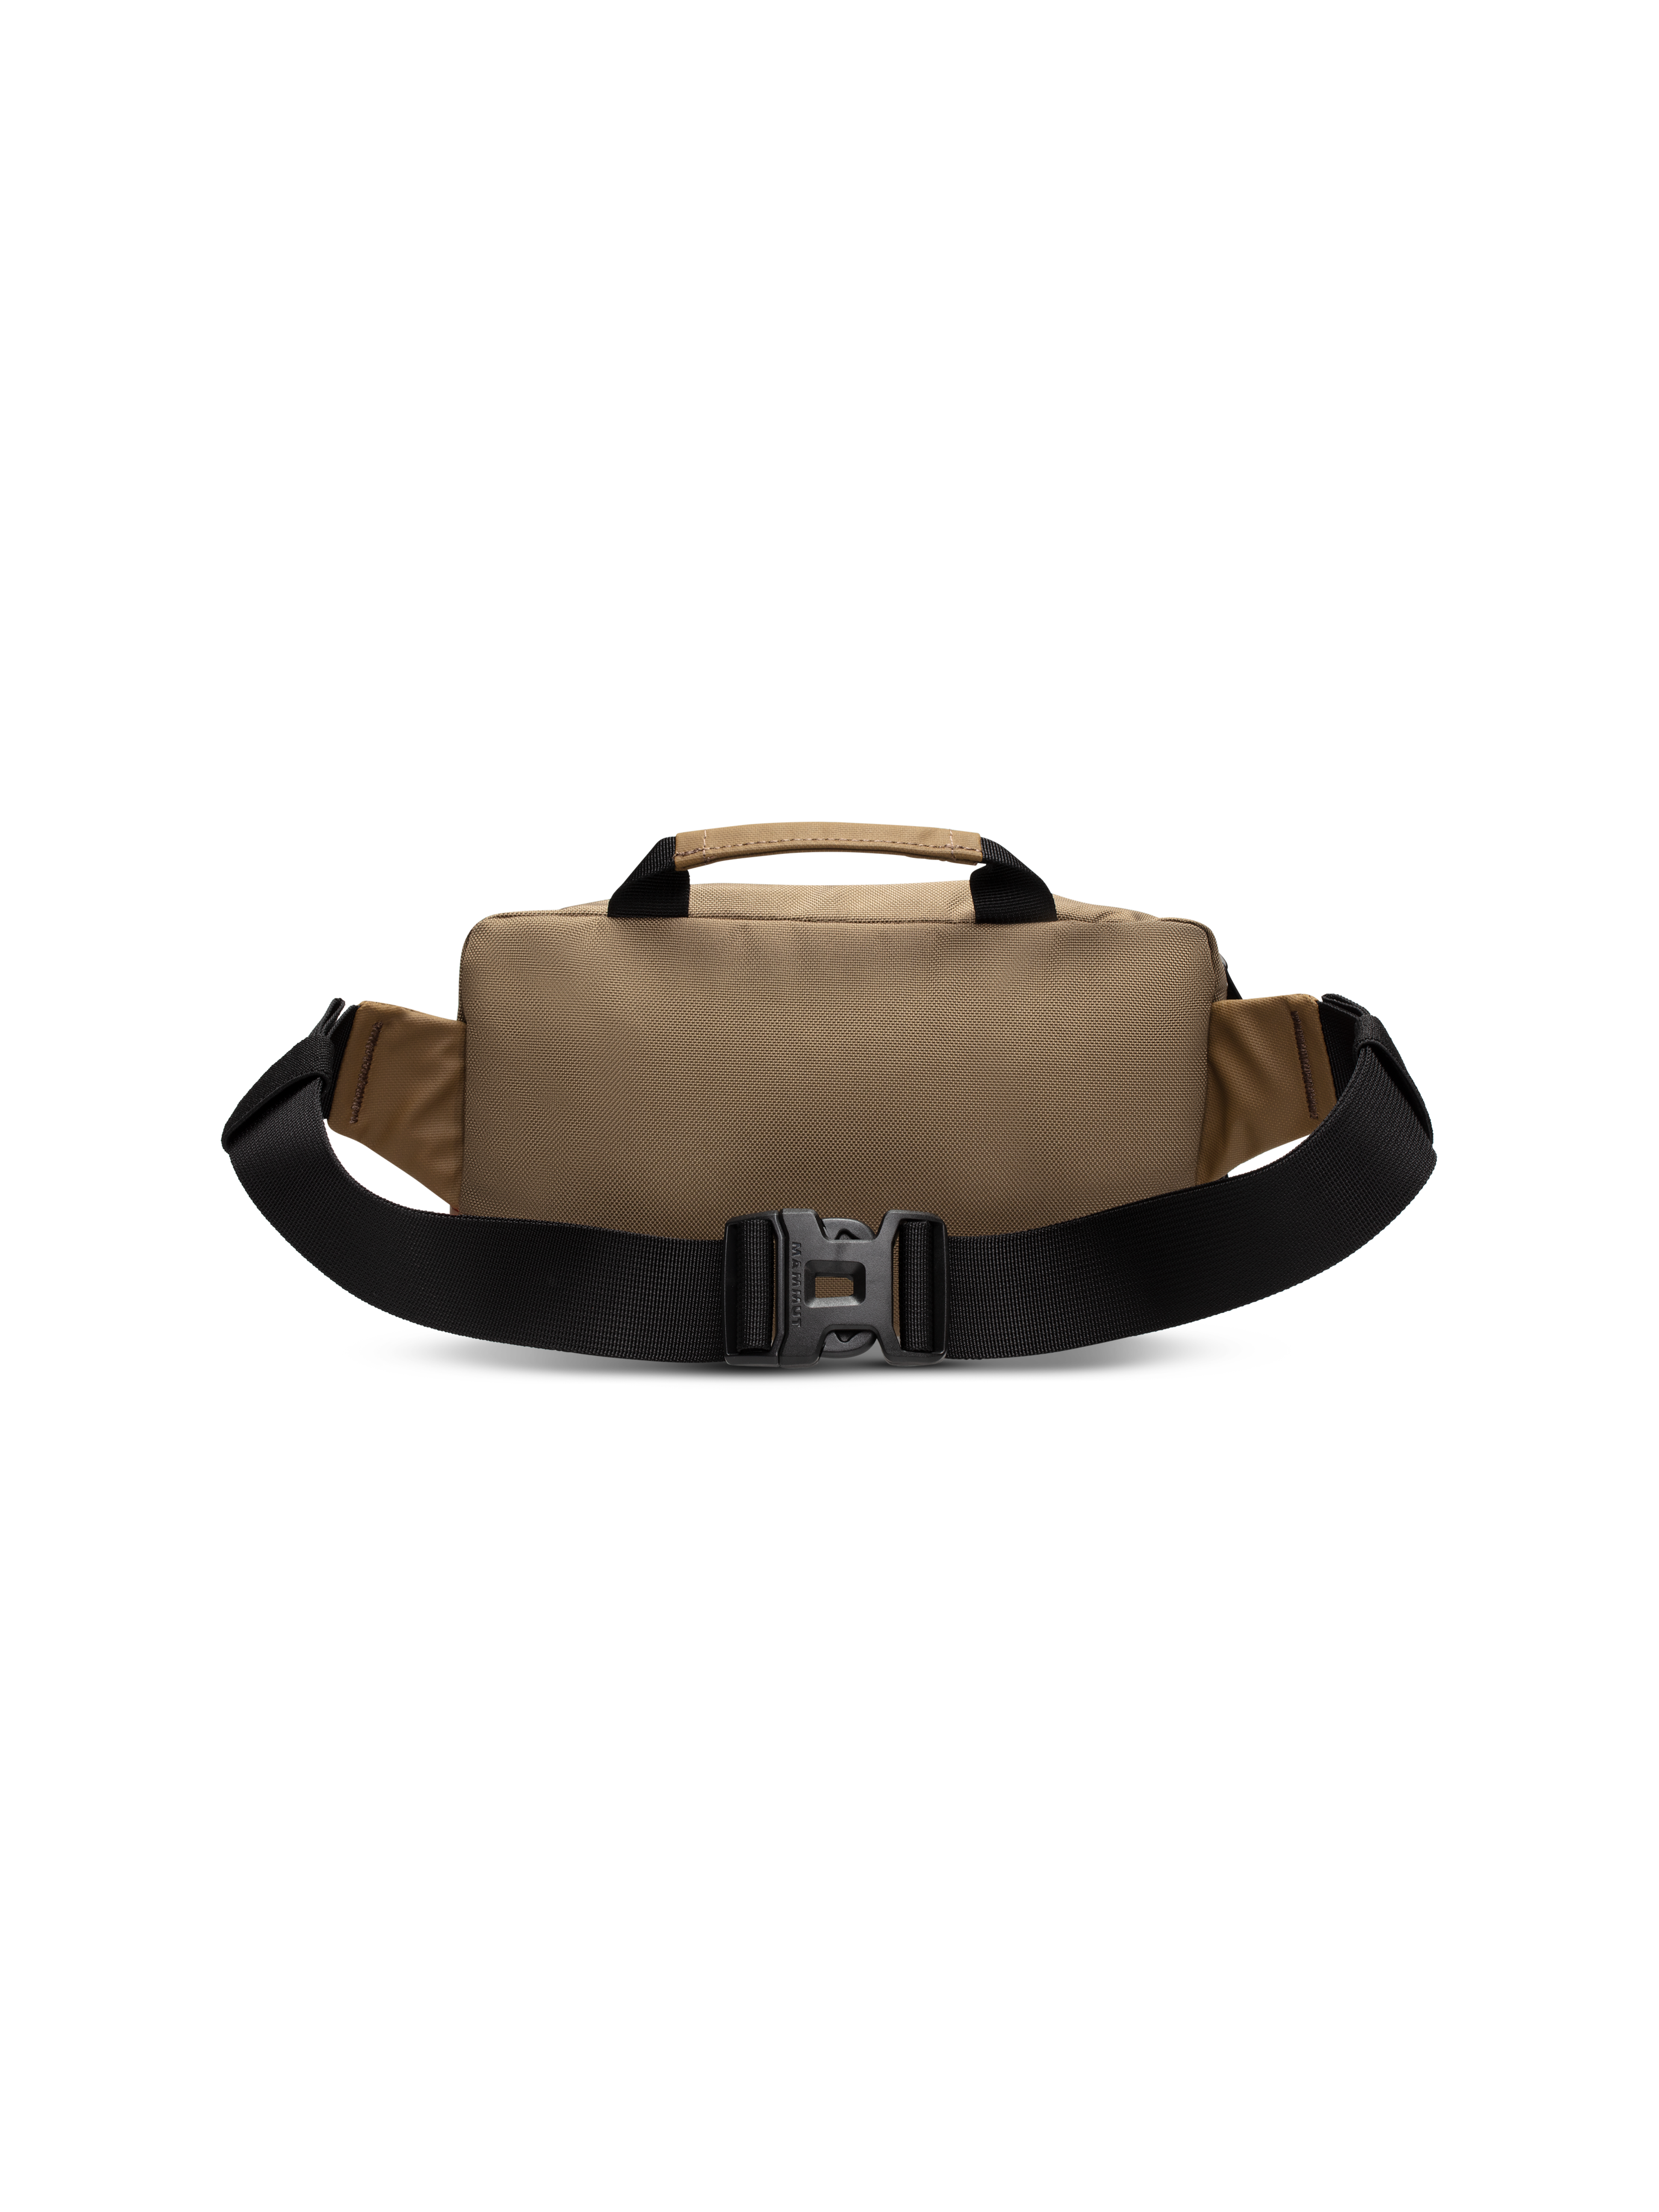 Seon Waistpack product image